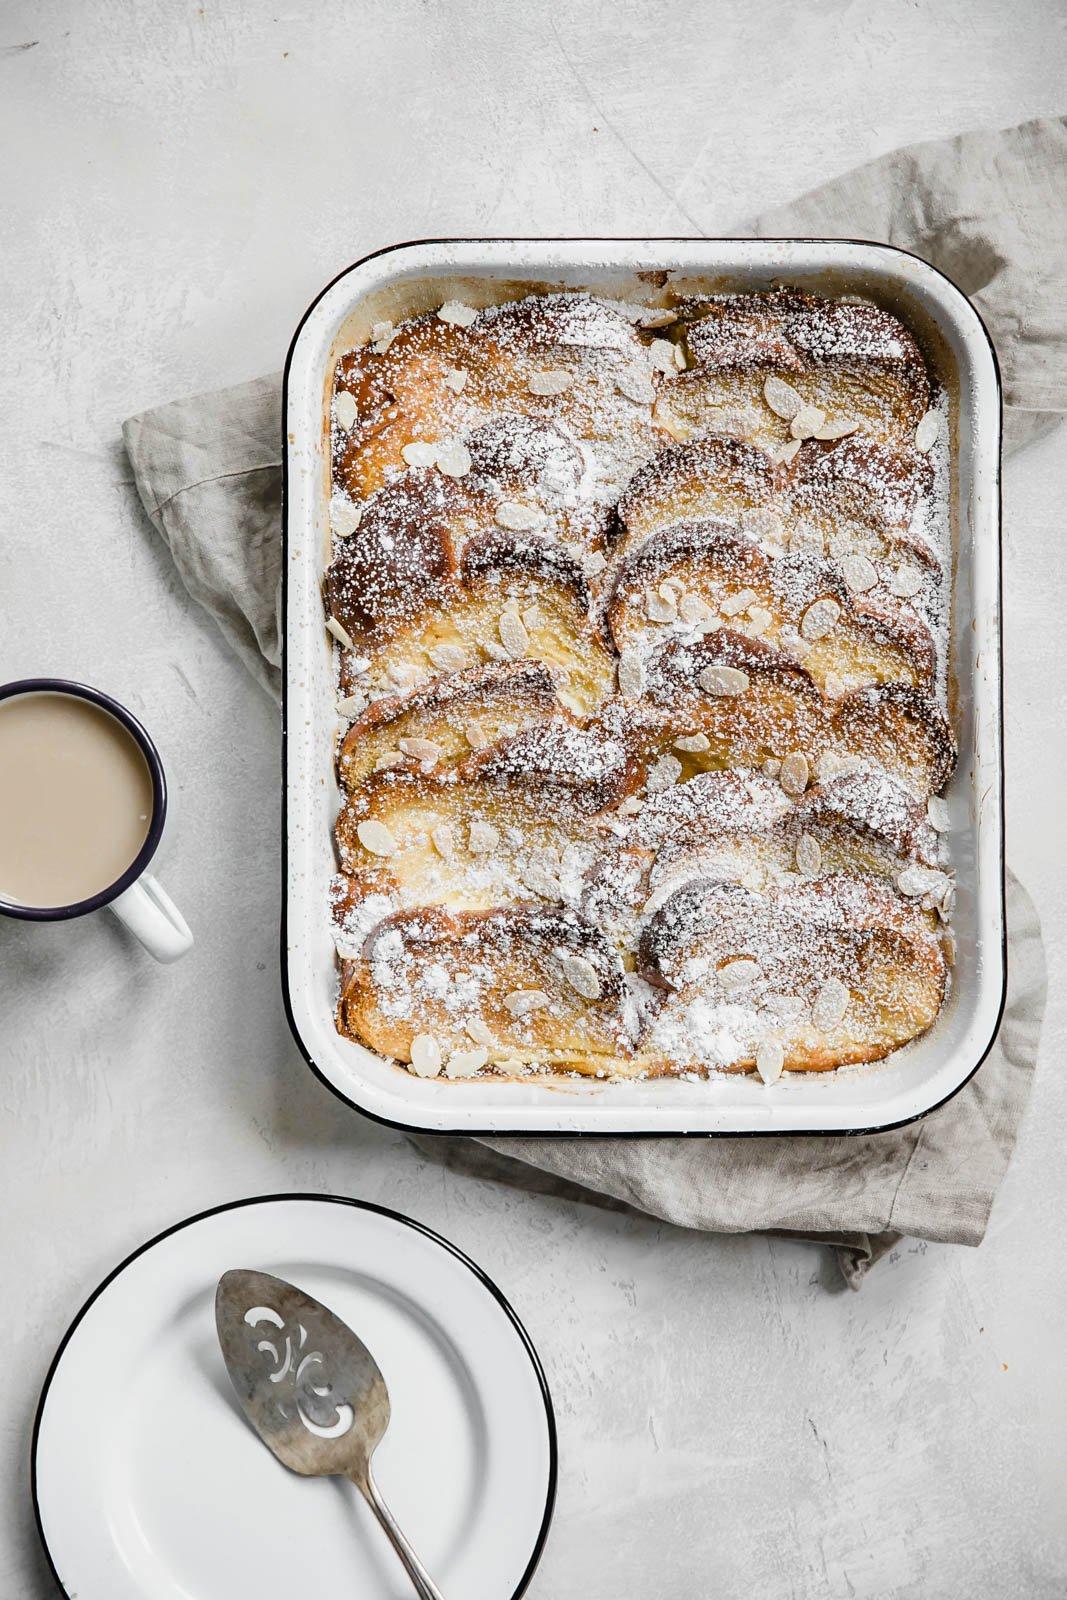 creme brulee french toast I howsweeteats.com #frenchtoast #breakfast #holiday #christmas #cremebrulee